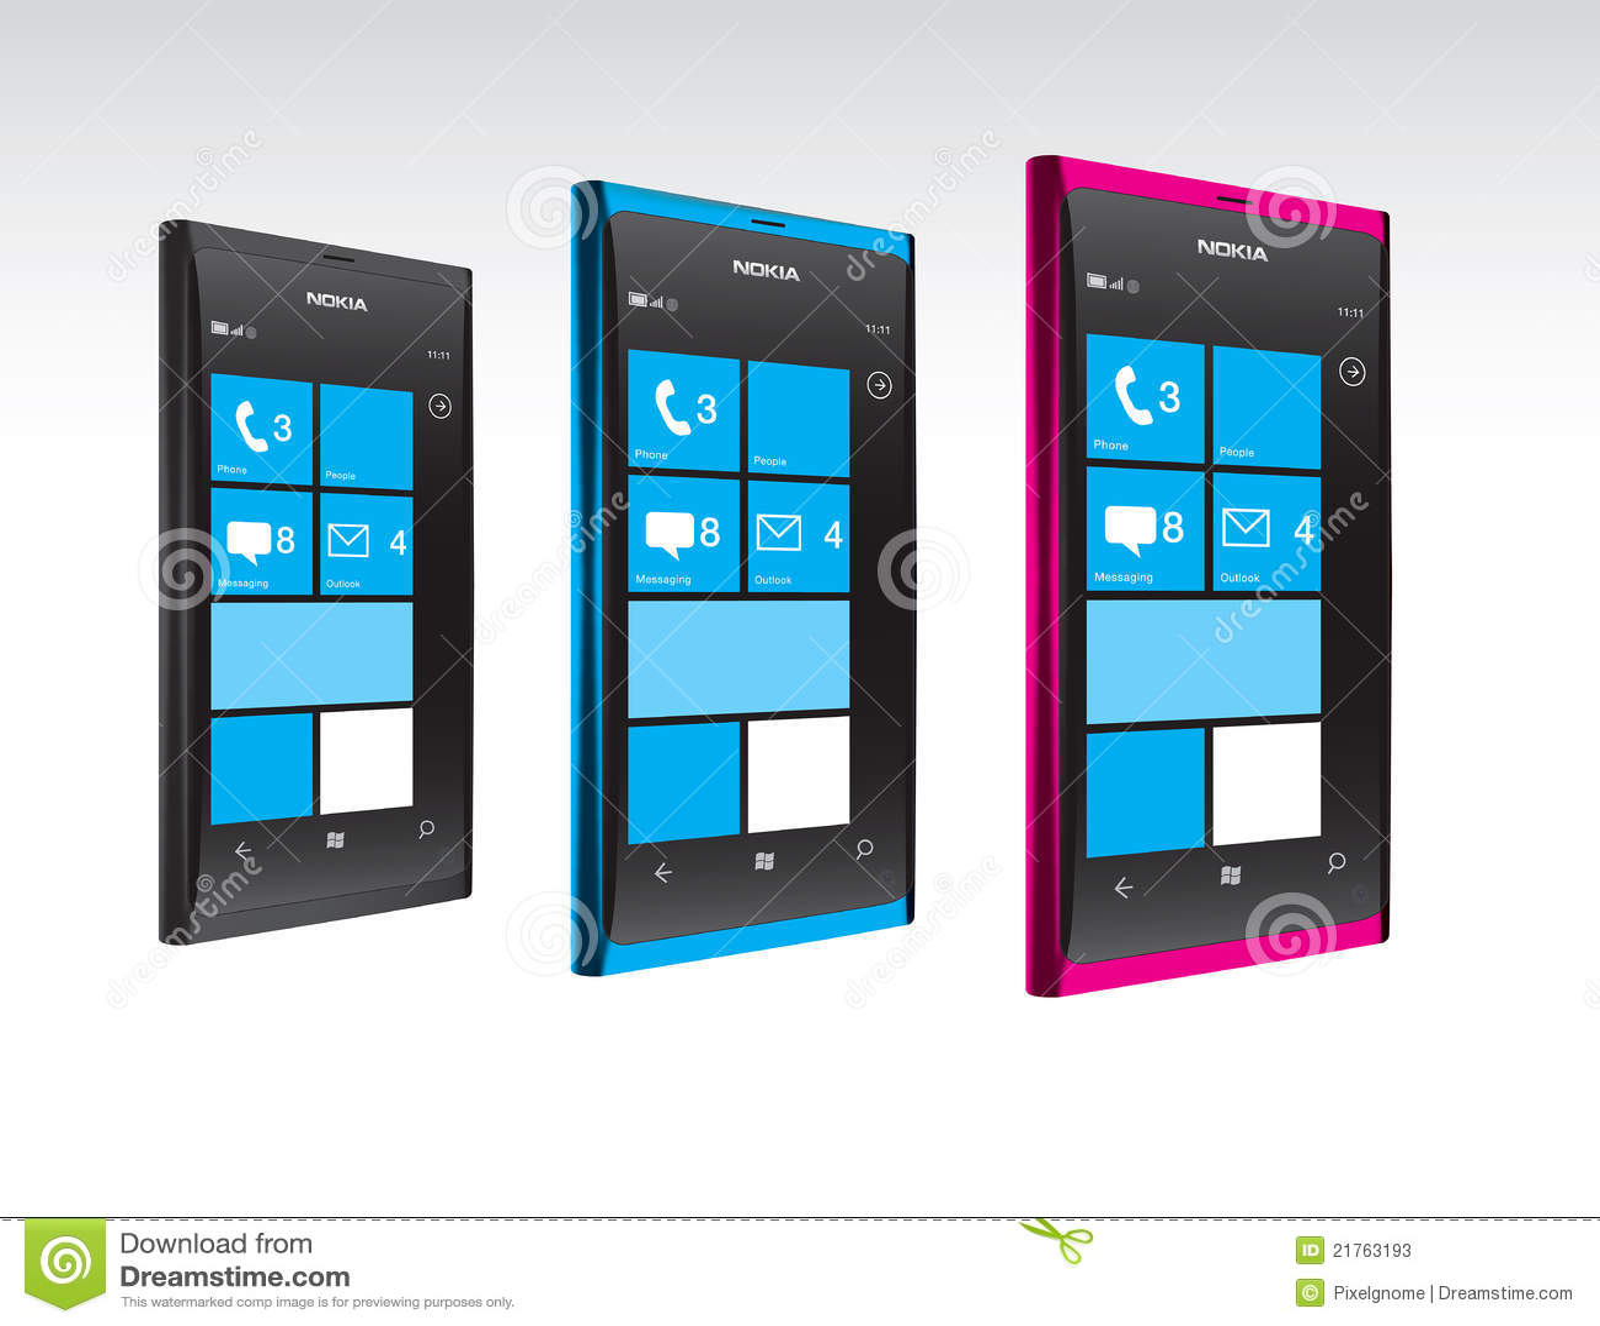 Newest Nokia Lumia Windows Phone